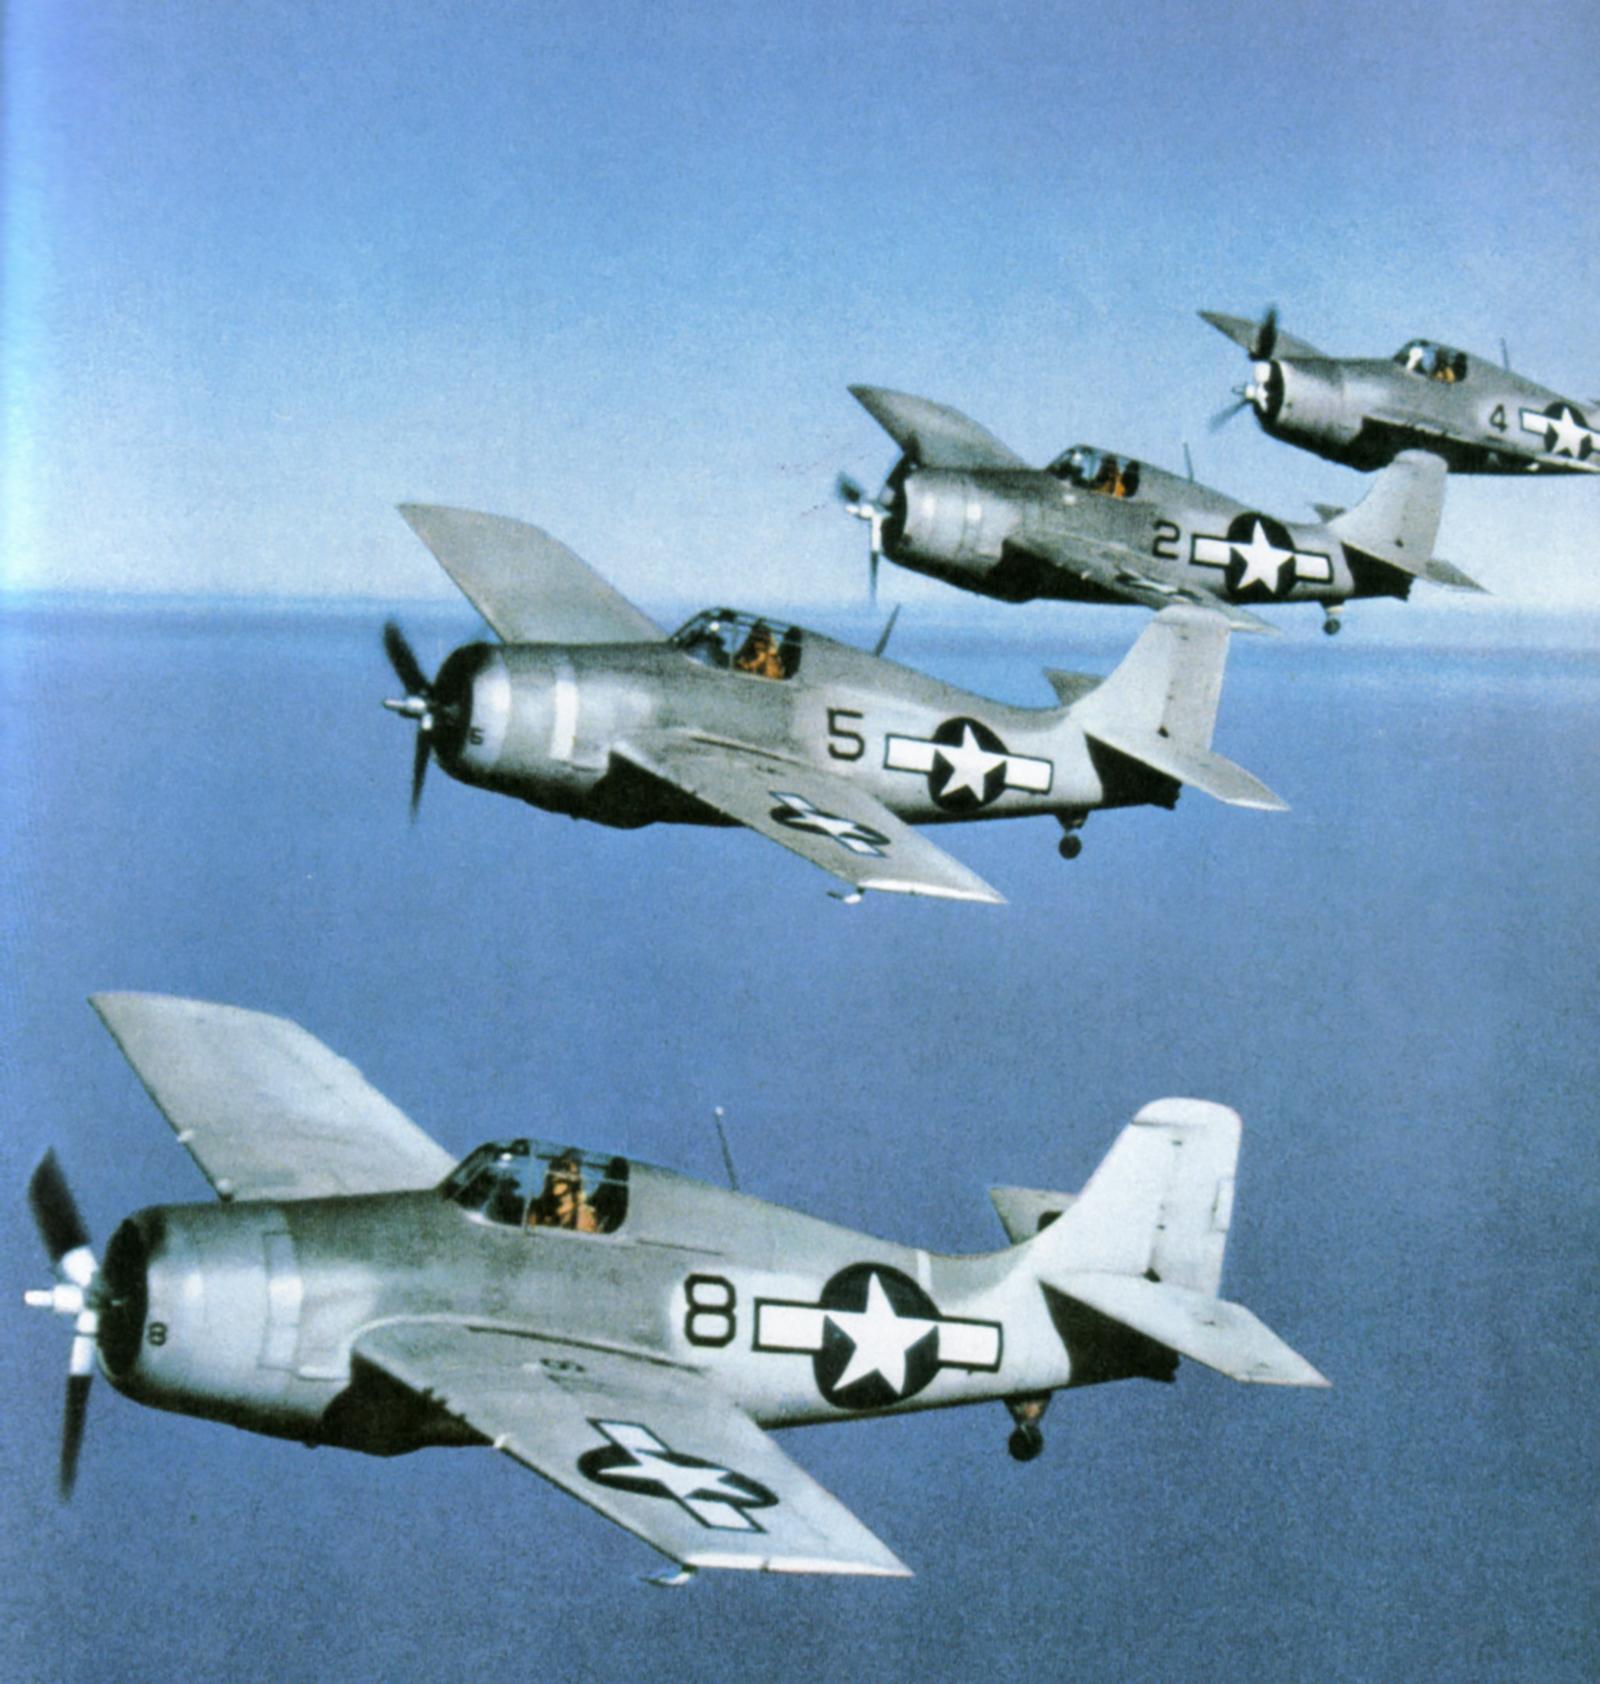 Grumman F4F 4 Wildcat Black 8, 5, 2 and 4 painted in the Atlantic scheme 01